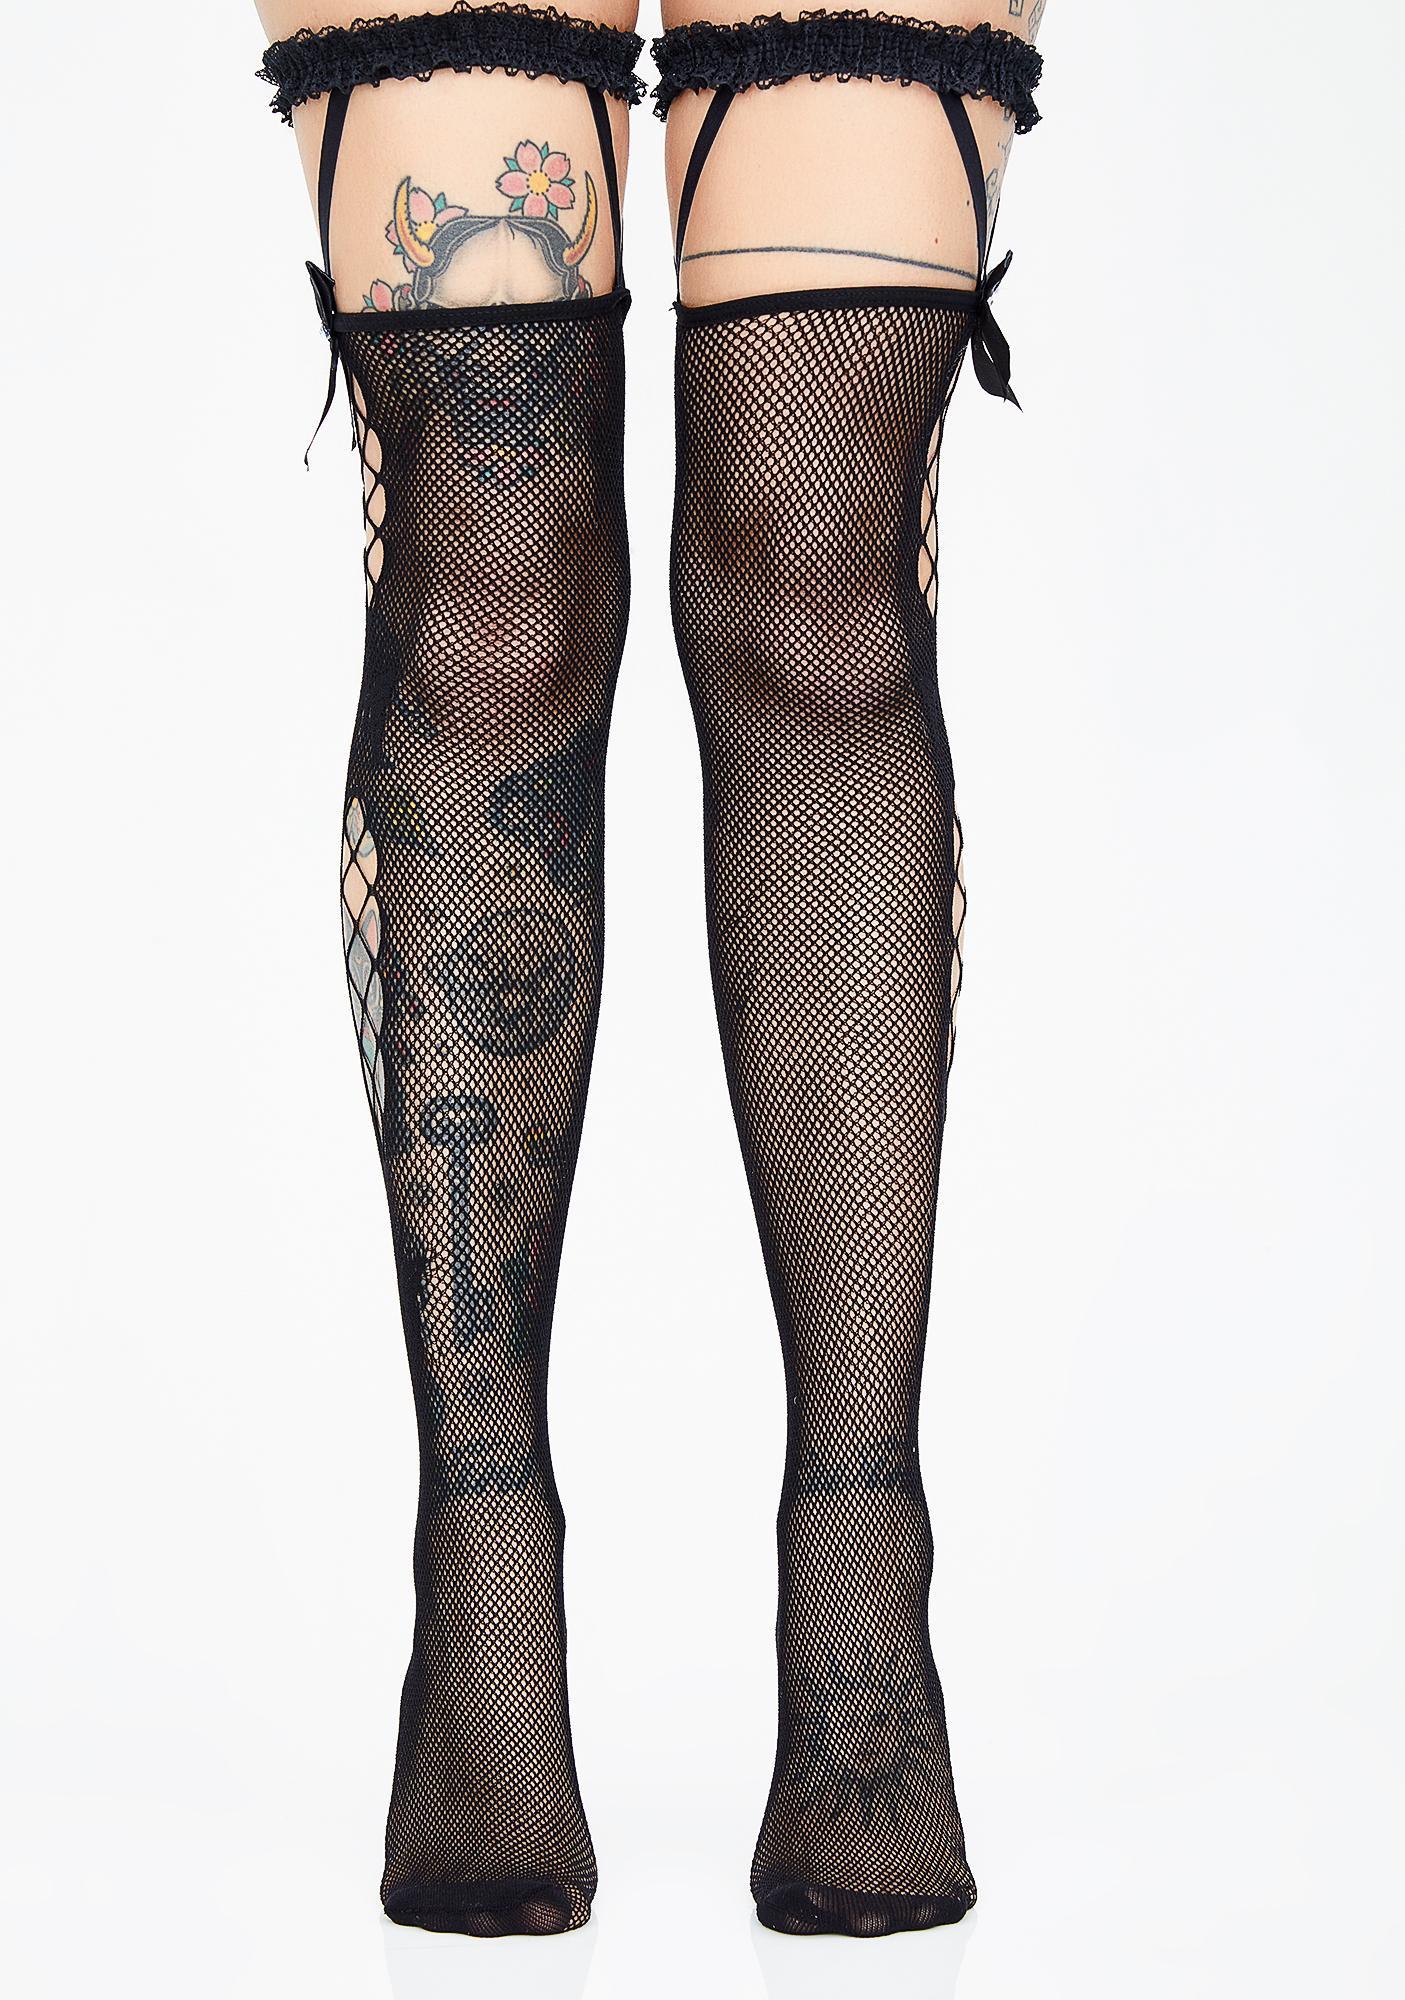 Stage Presence Garter Stockings